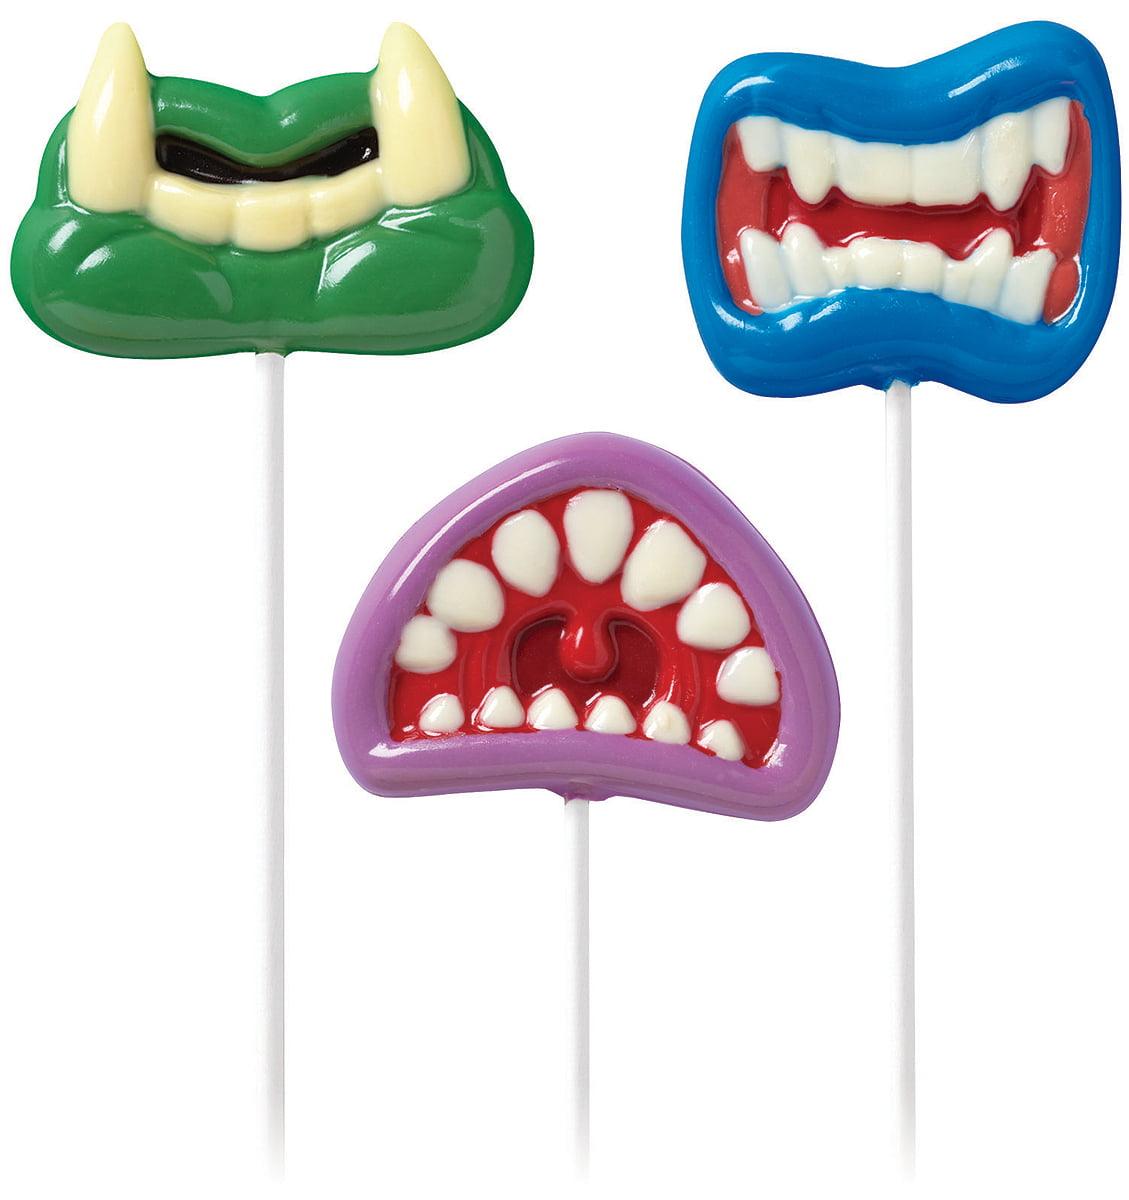 Lollipop Mold-Monster Mouth 3 Cavities (3 Designs)